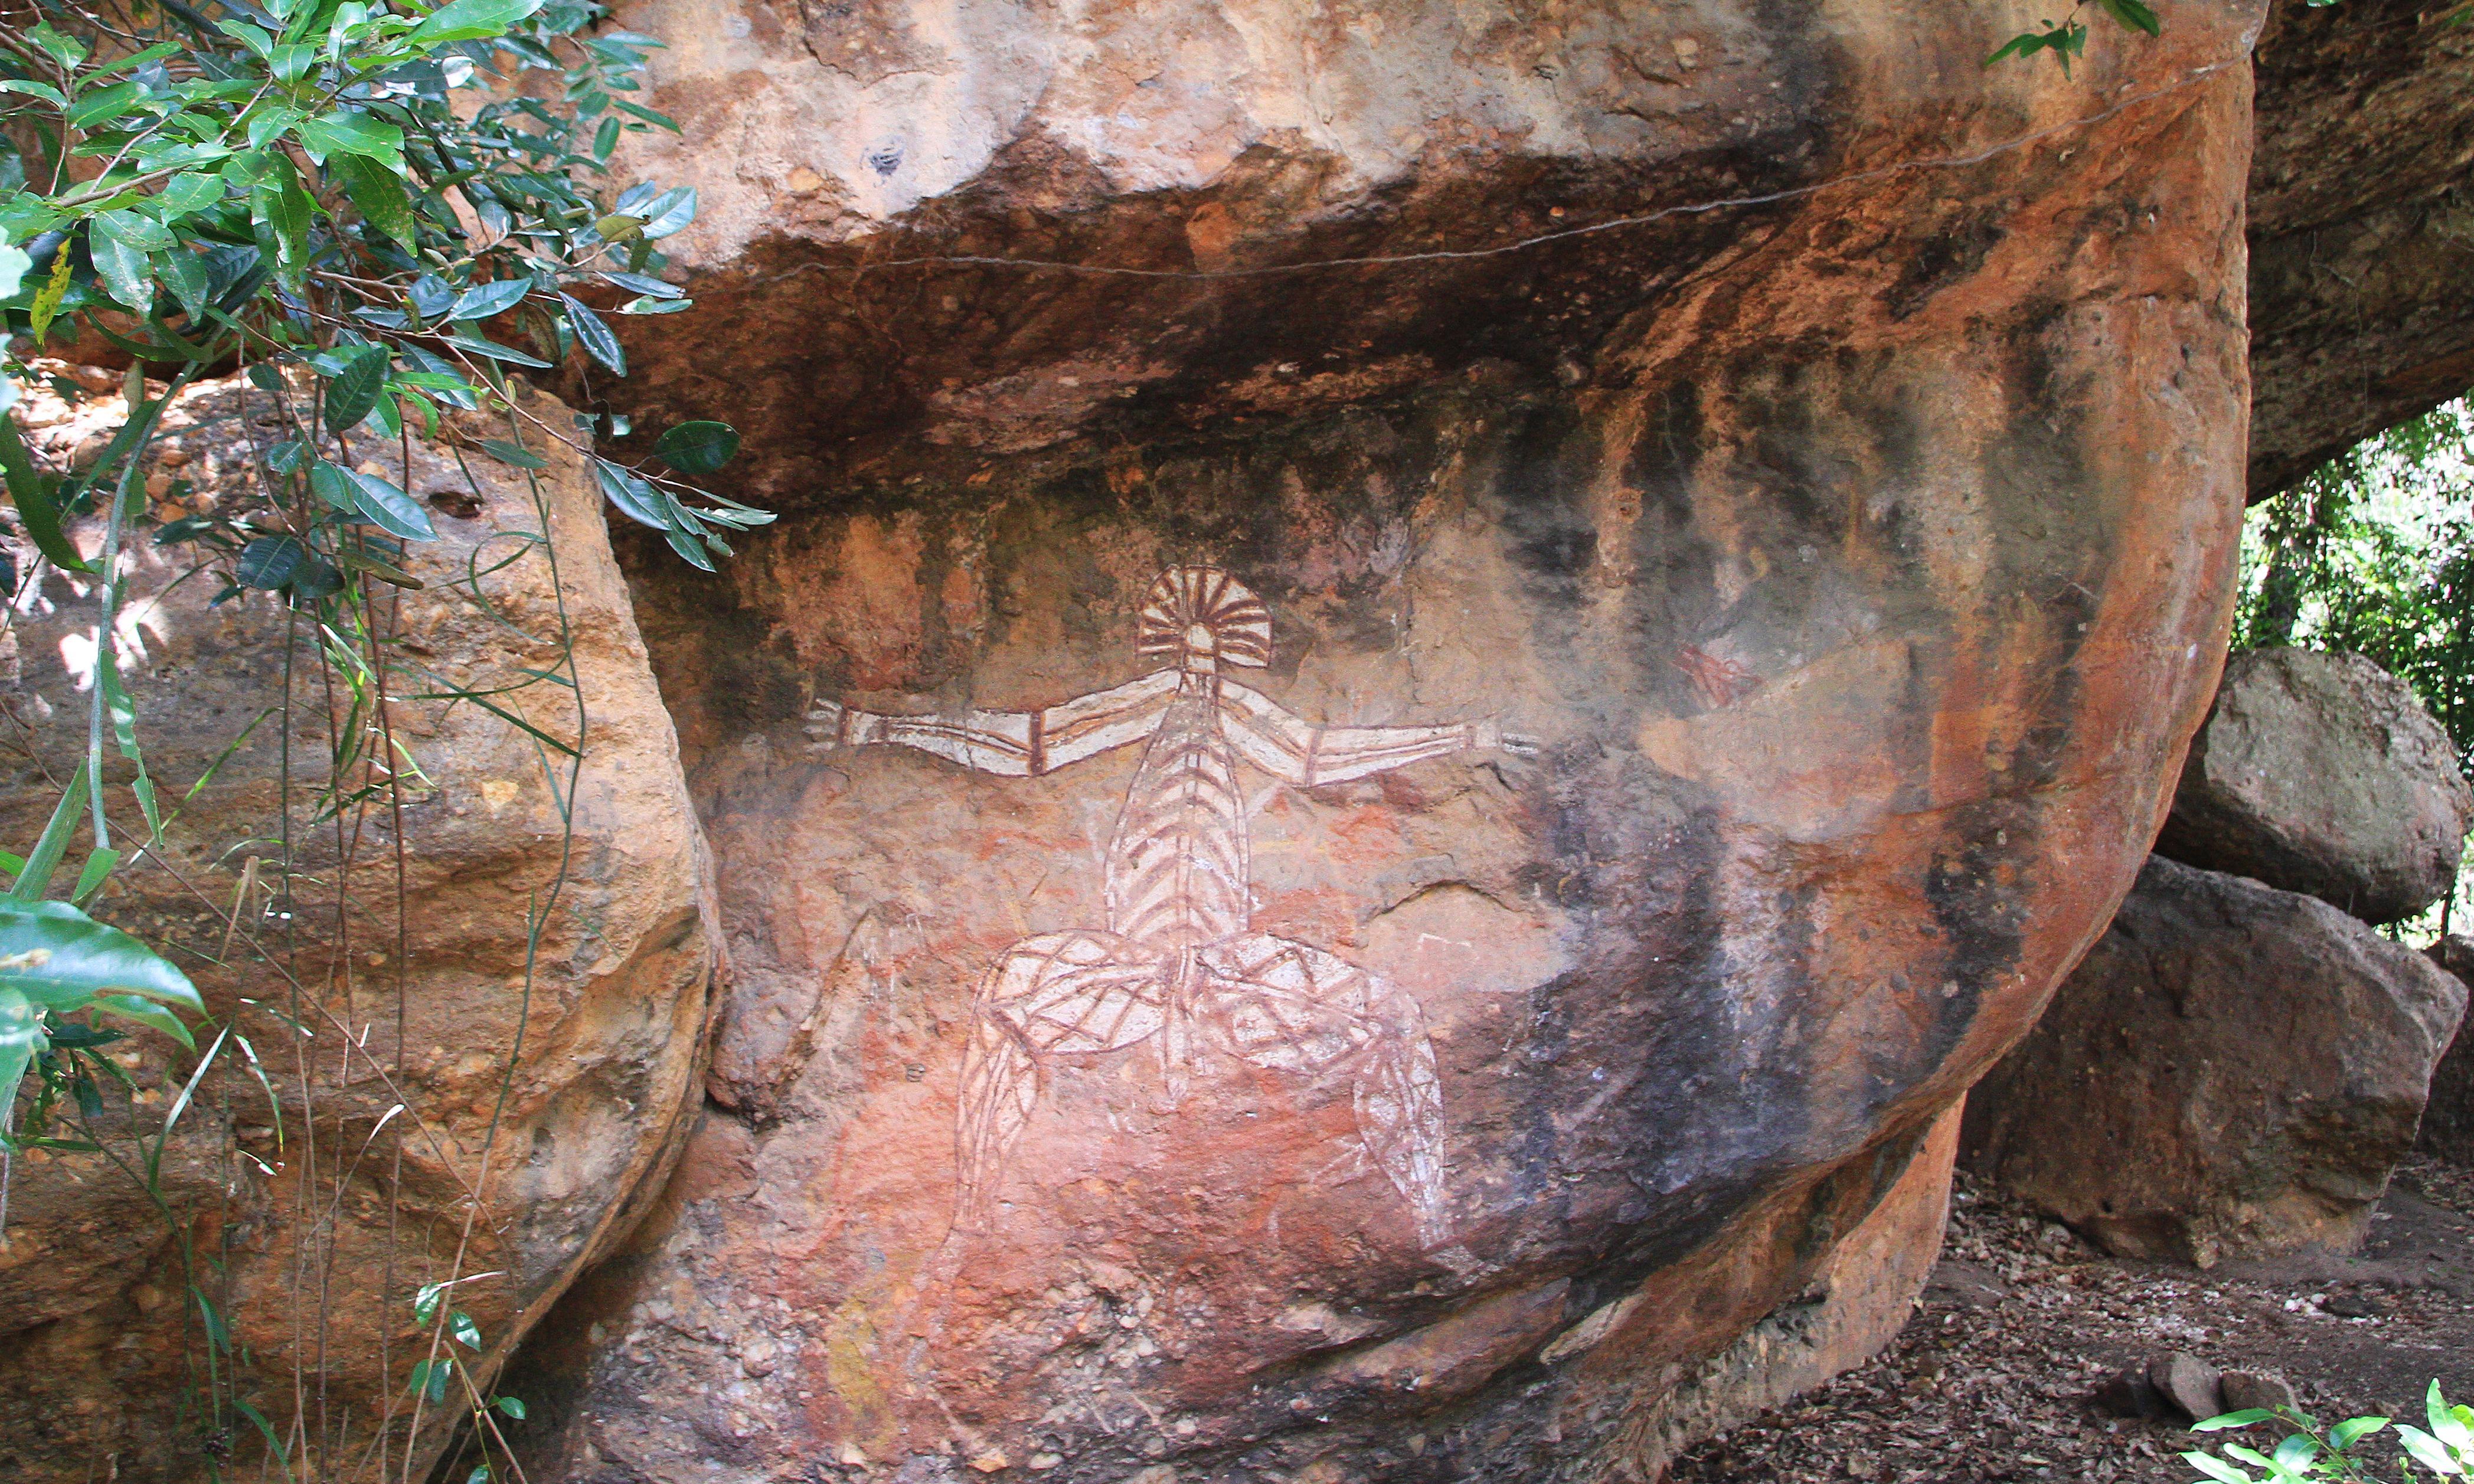 Revealed: how Indigenous Australian storytelling accurately records sea level rises 7,000 years ago